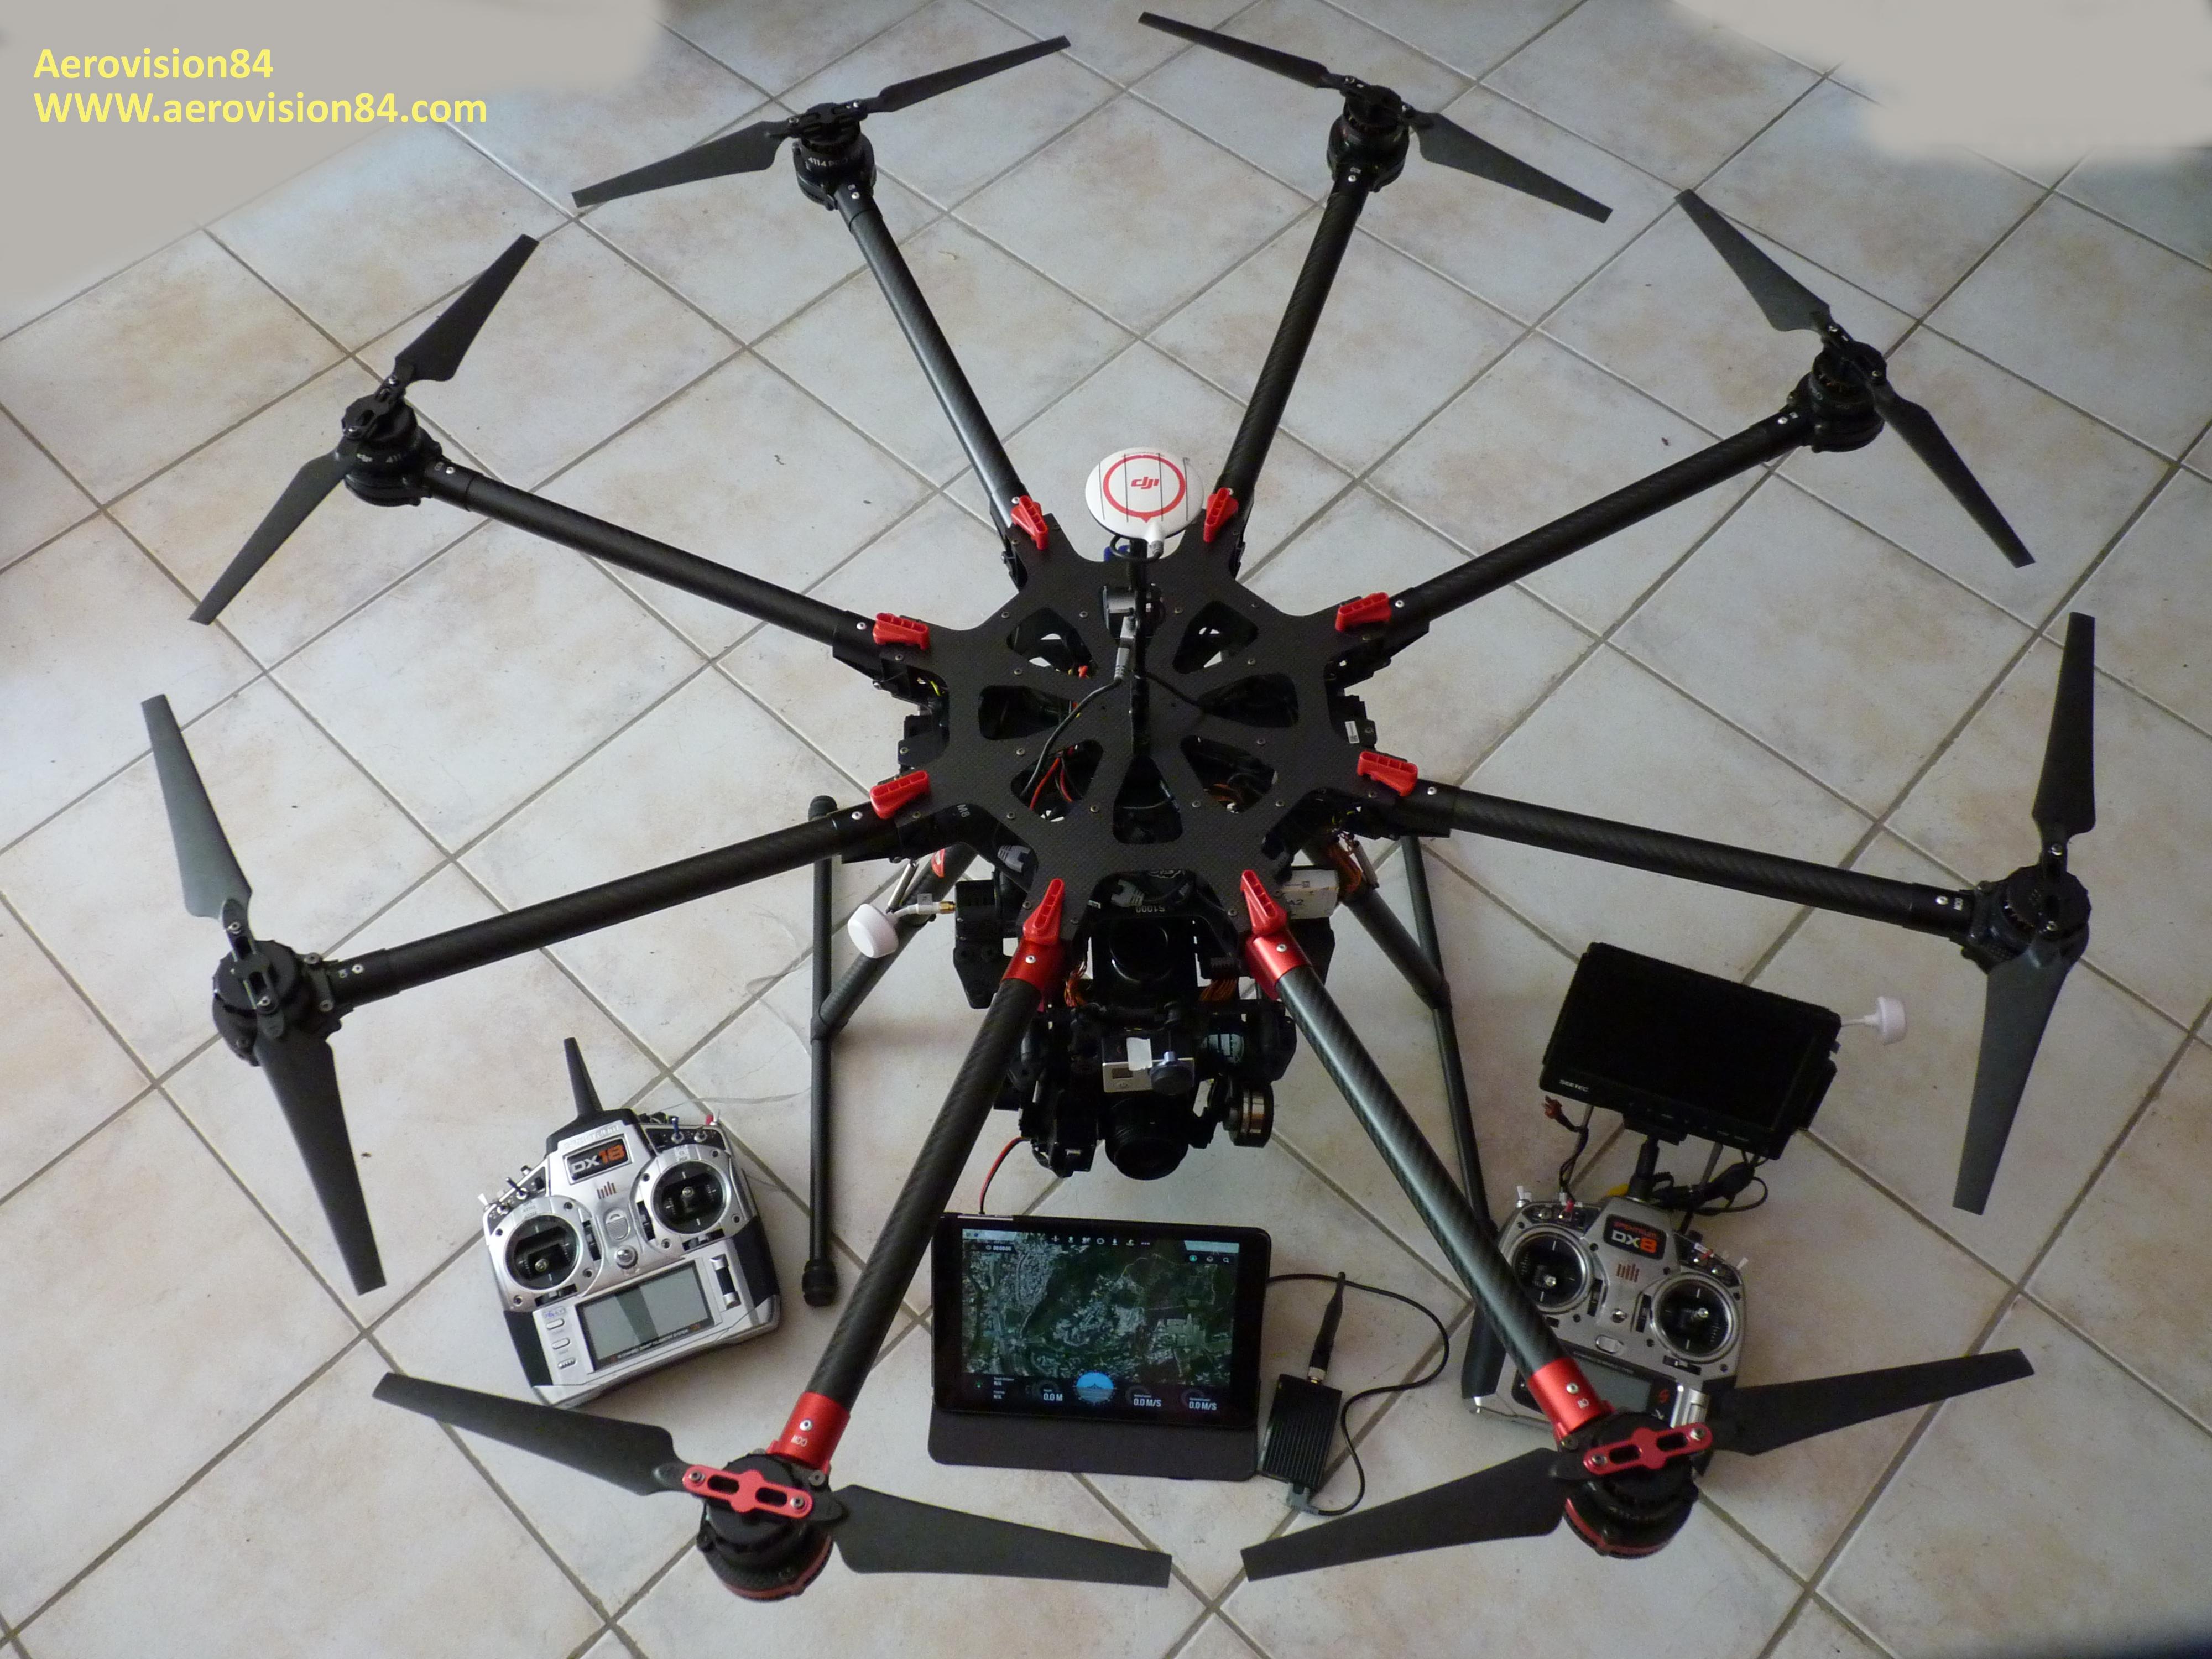 vaucluse drone aerovision84